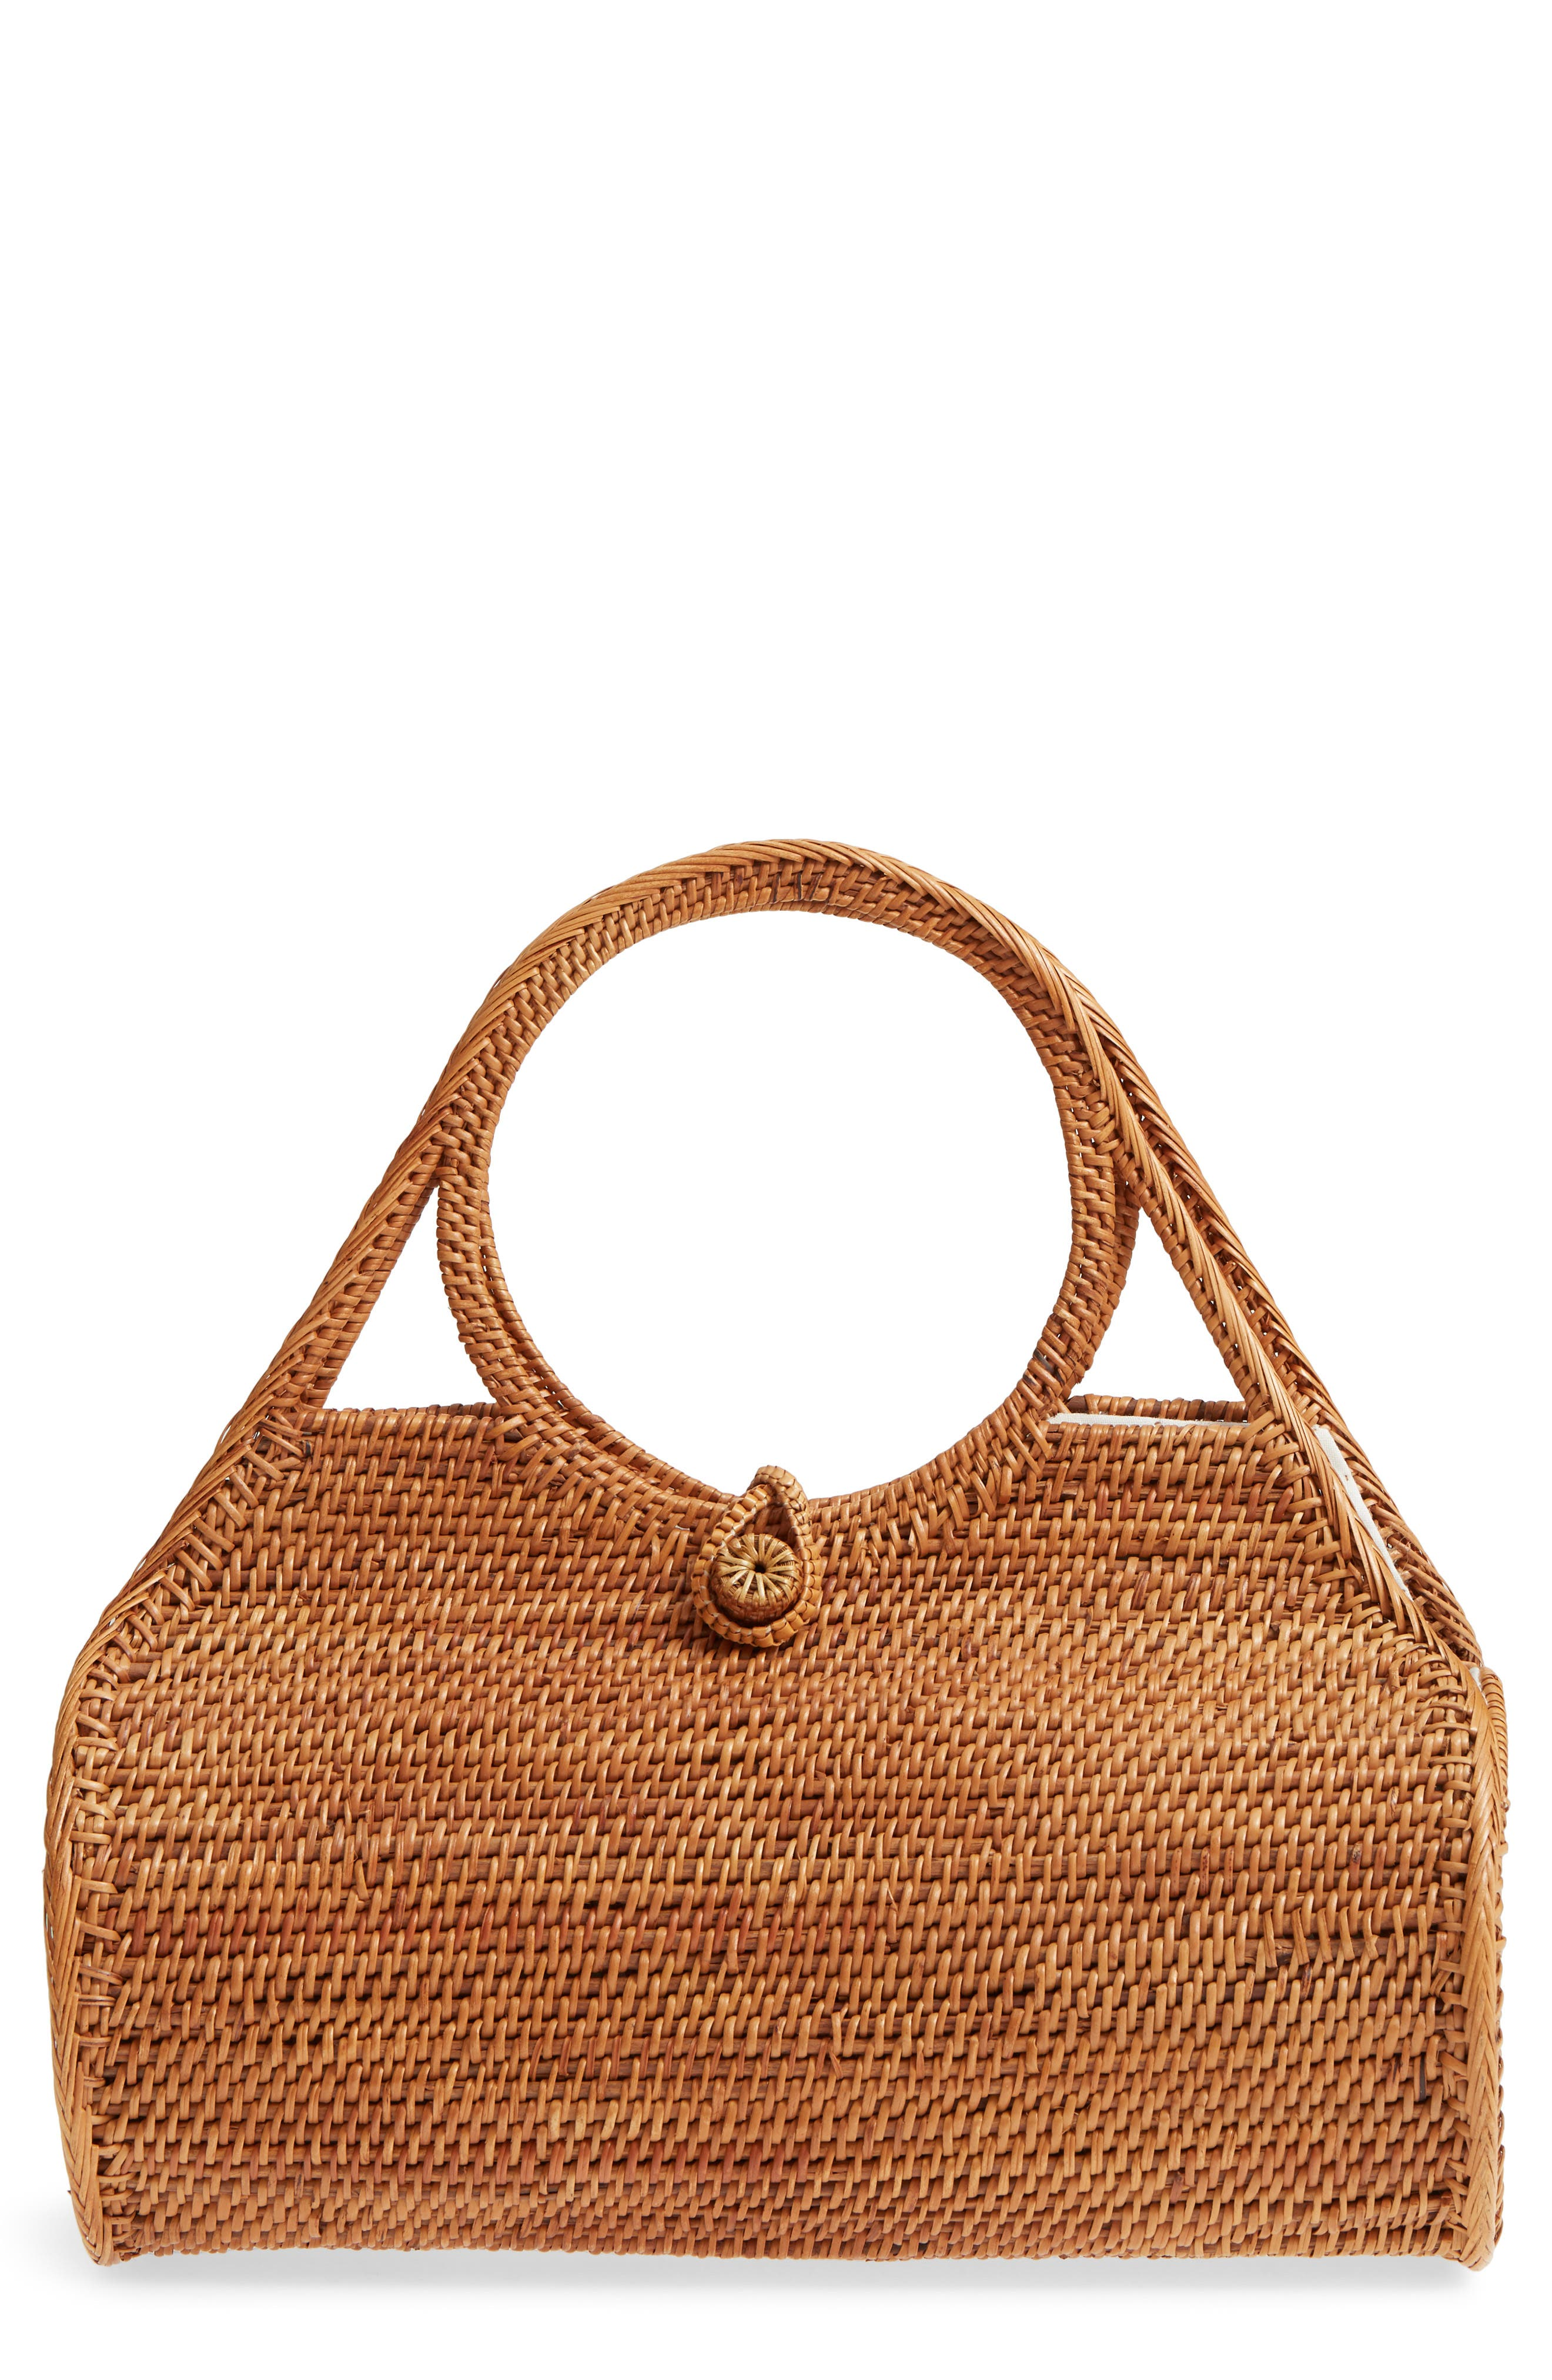 Woven Rattan Handbag,                         Main,                         color, Tan